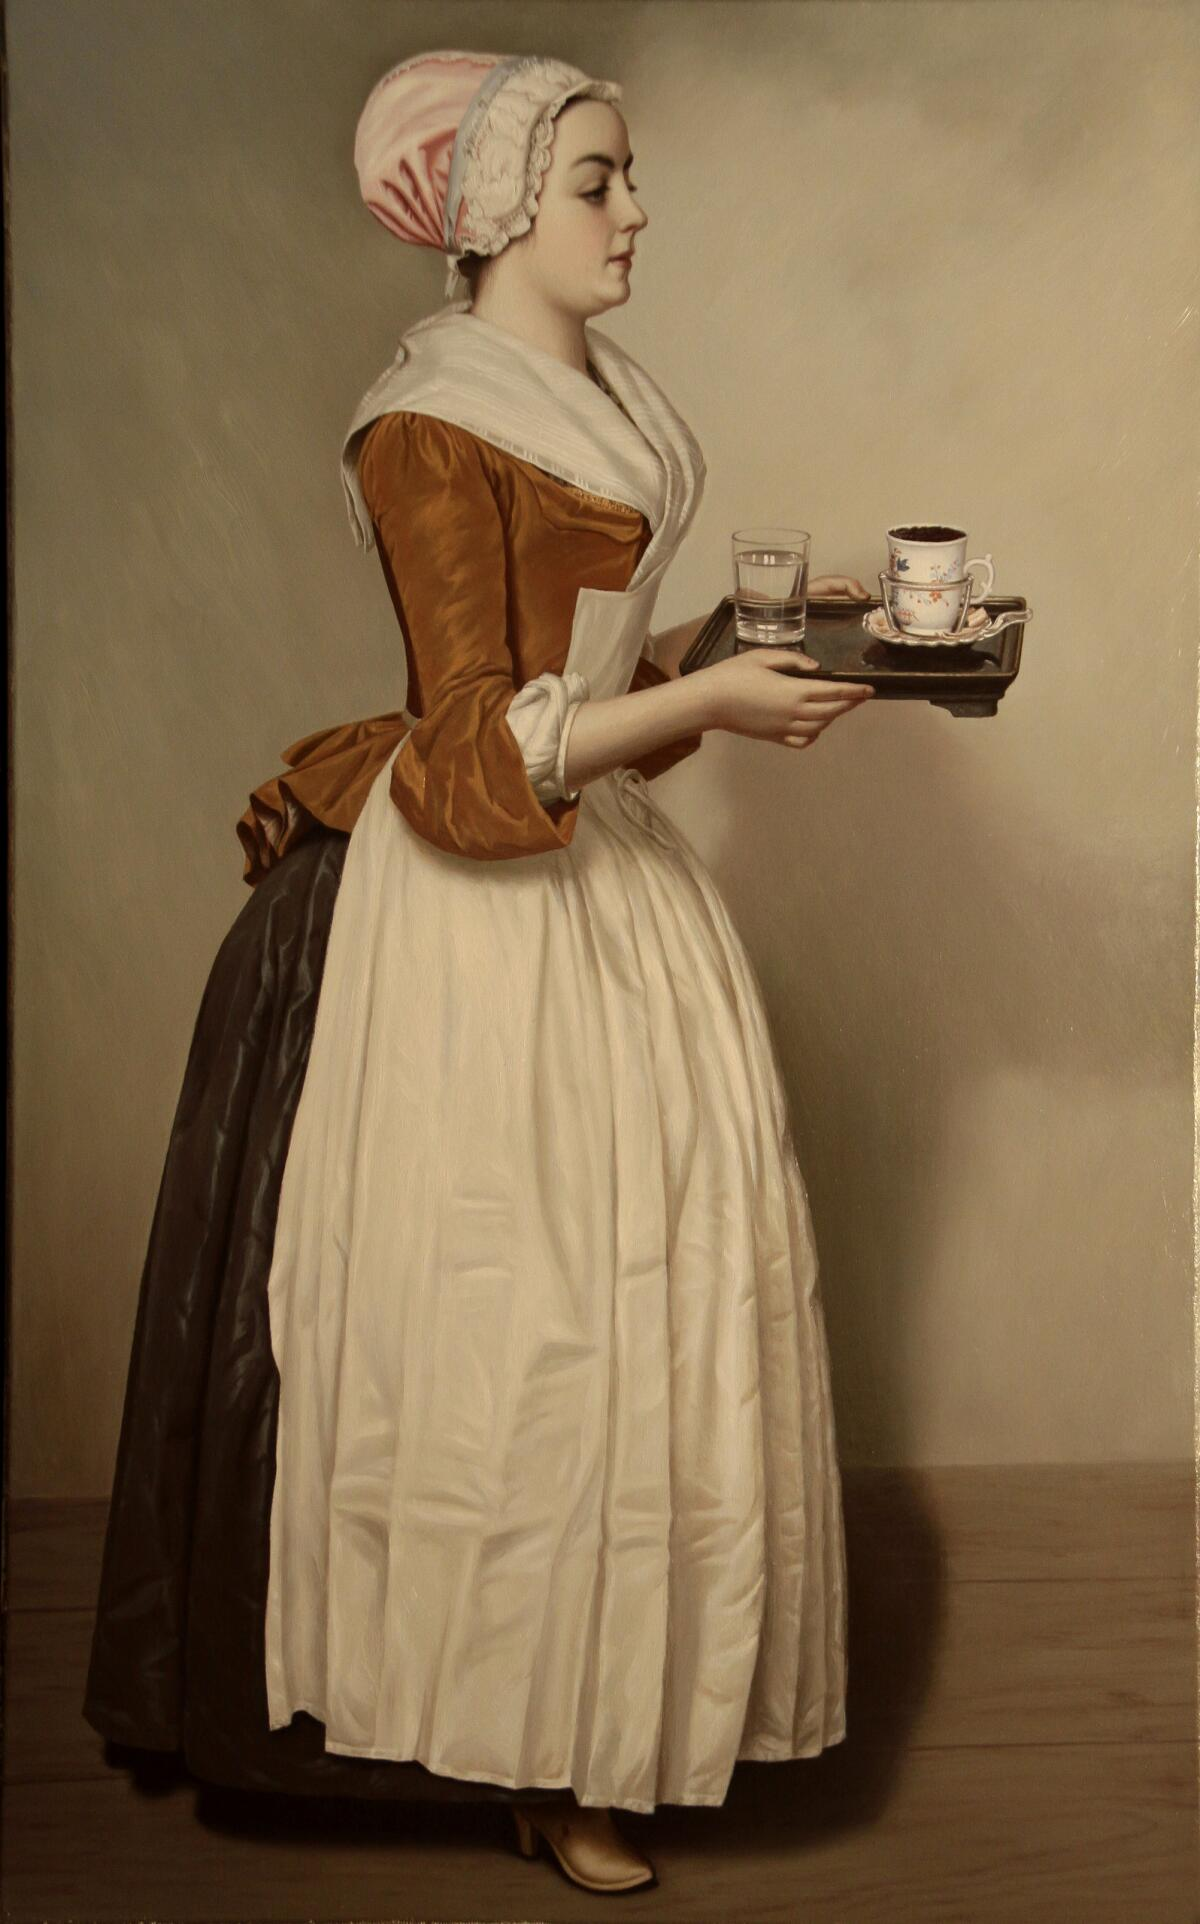 Ж. Э. Лиотар, «Шоколадница», ок. 1743-1745 гг.